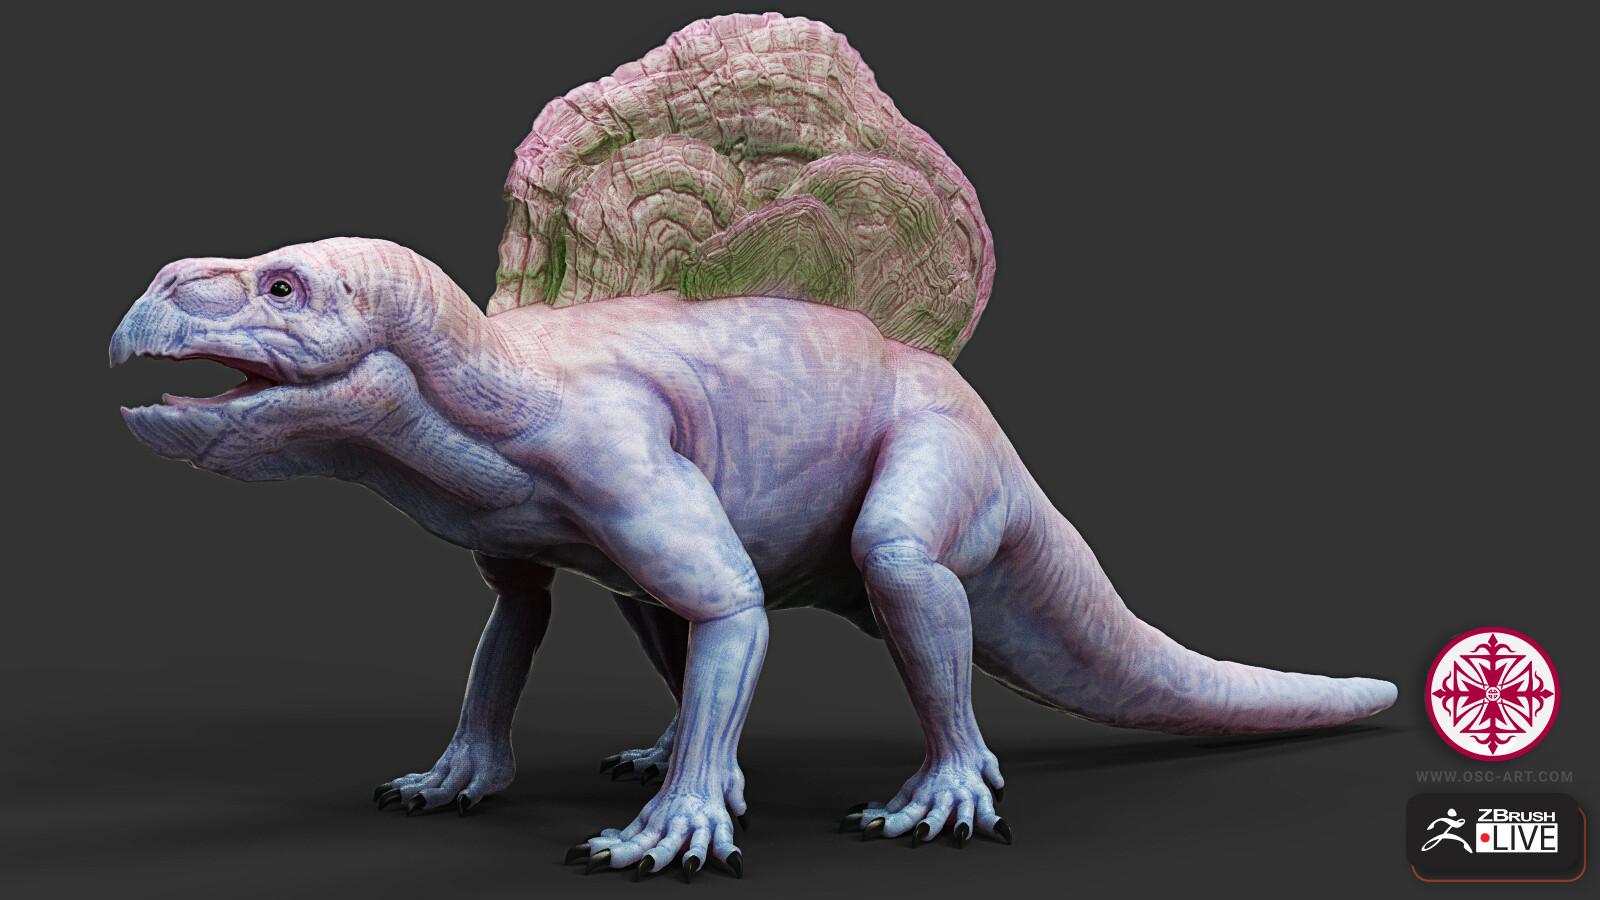 Stream 86 Fungisaur